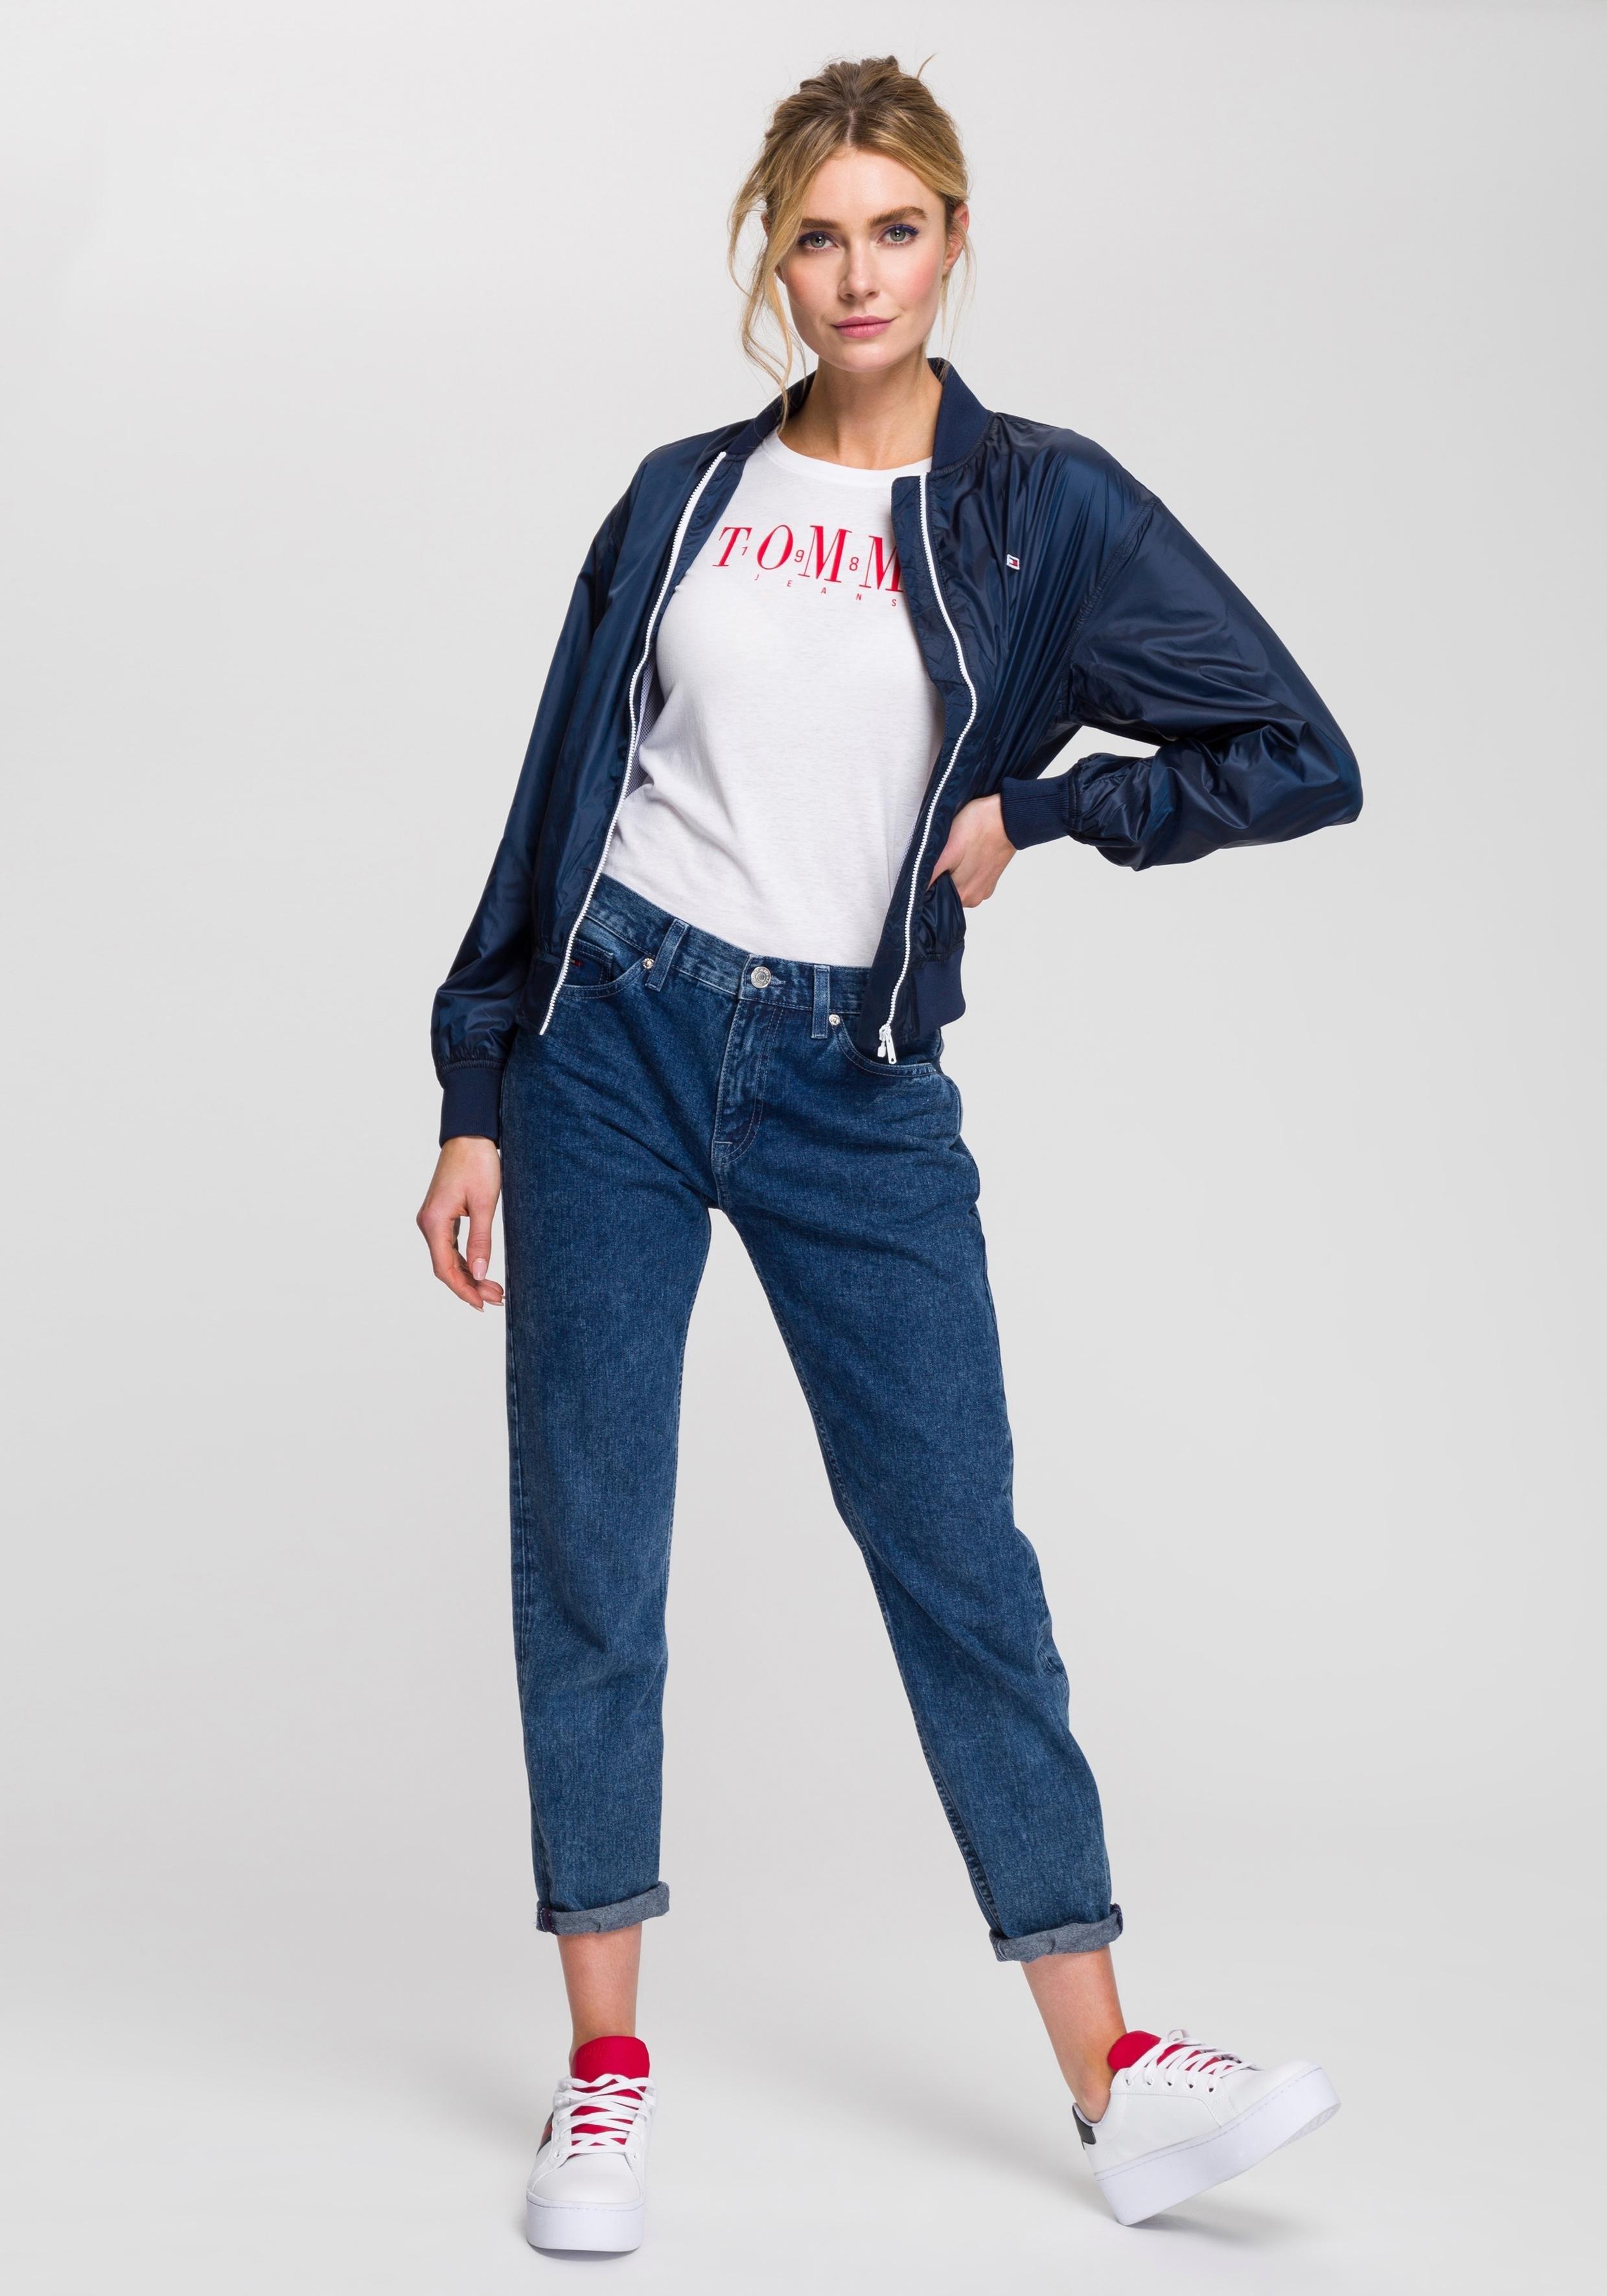 T shirt Jeans Makkelijk Gevonden Tommy nP08wOk